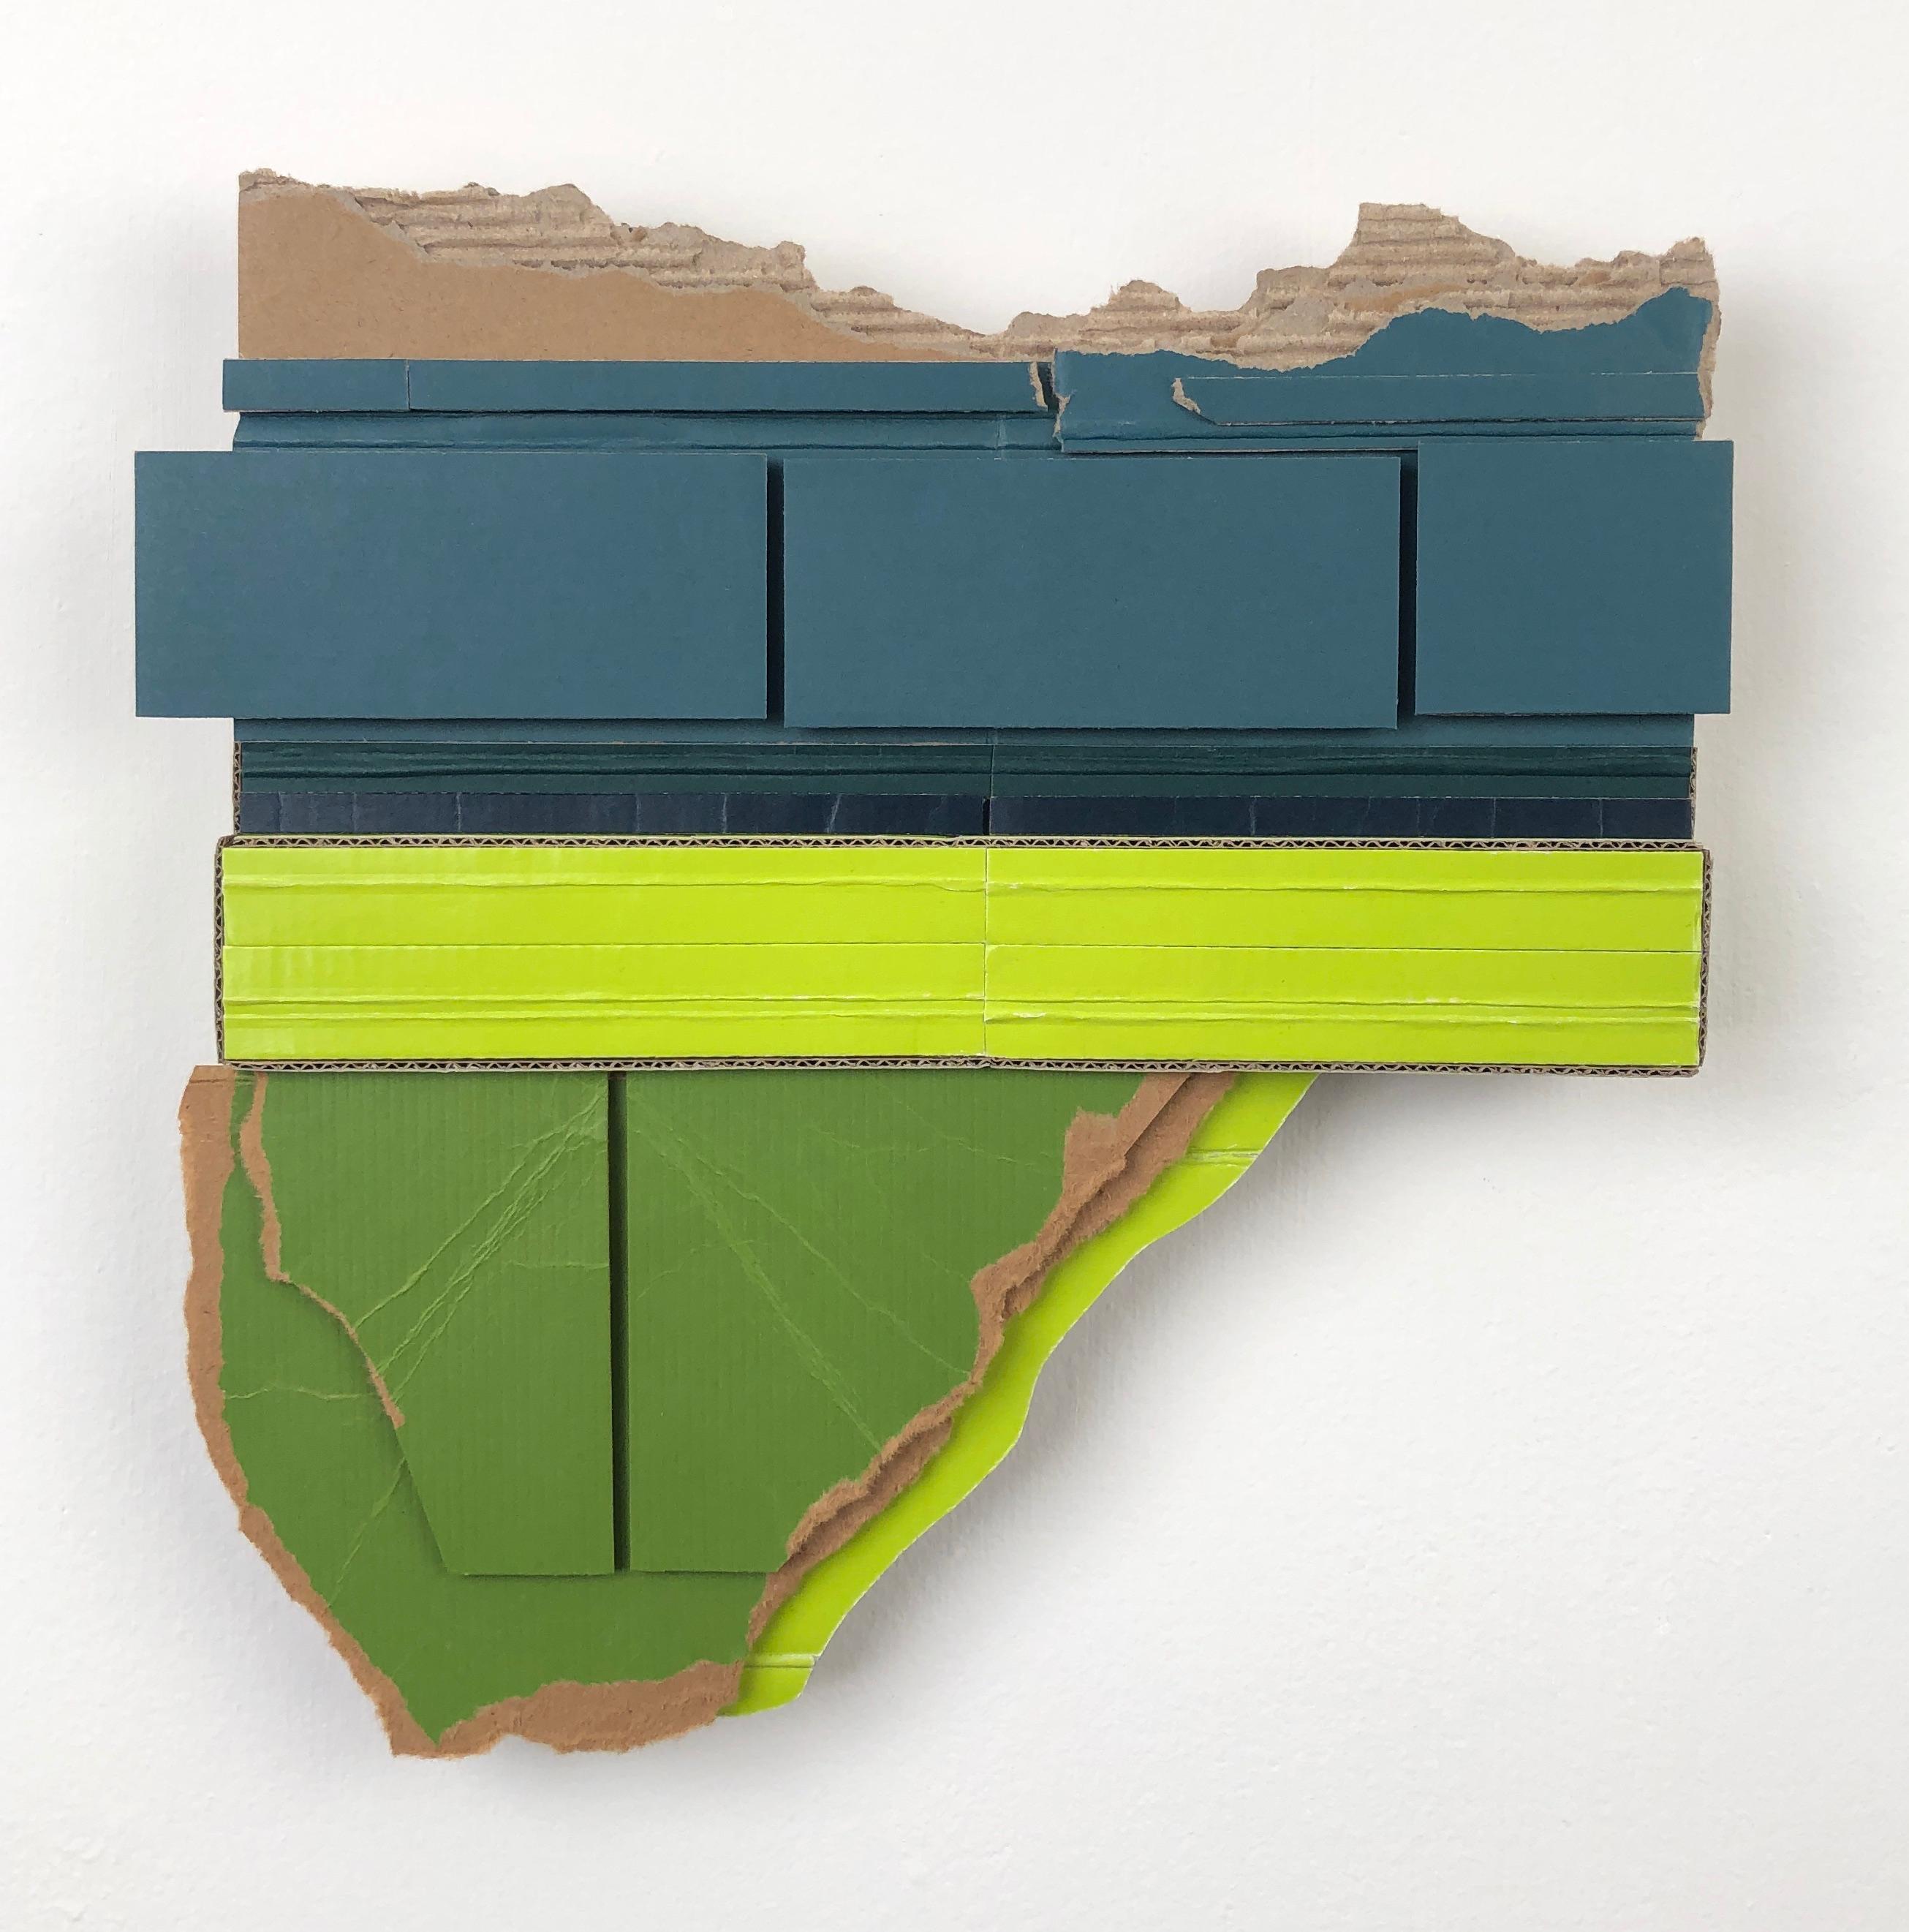 Ryan Sarah Murphy, Acreage, 2019, found (unpainted) cardboard, foamcore